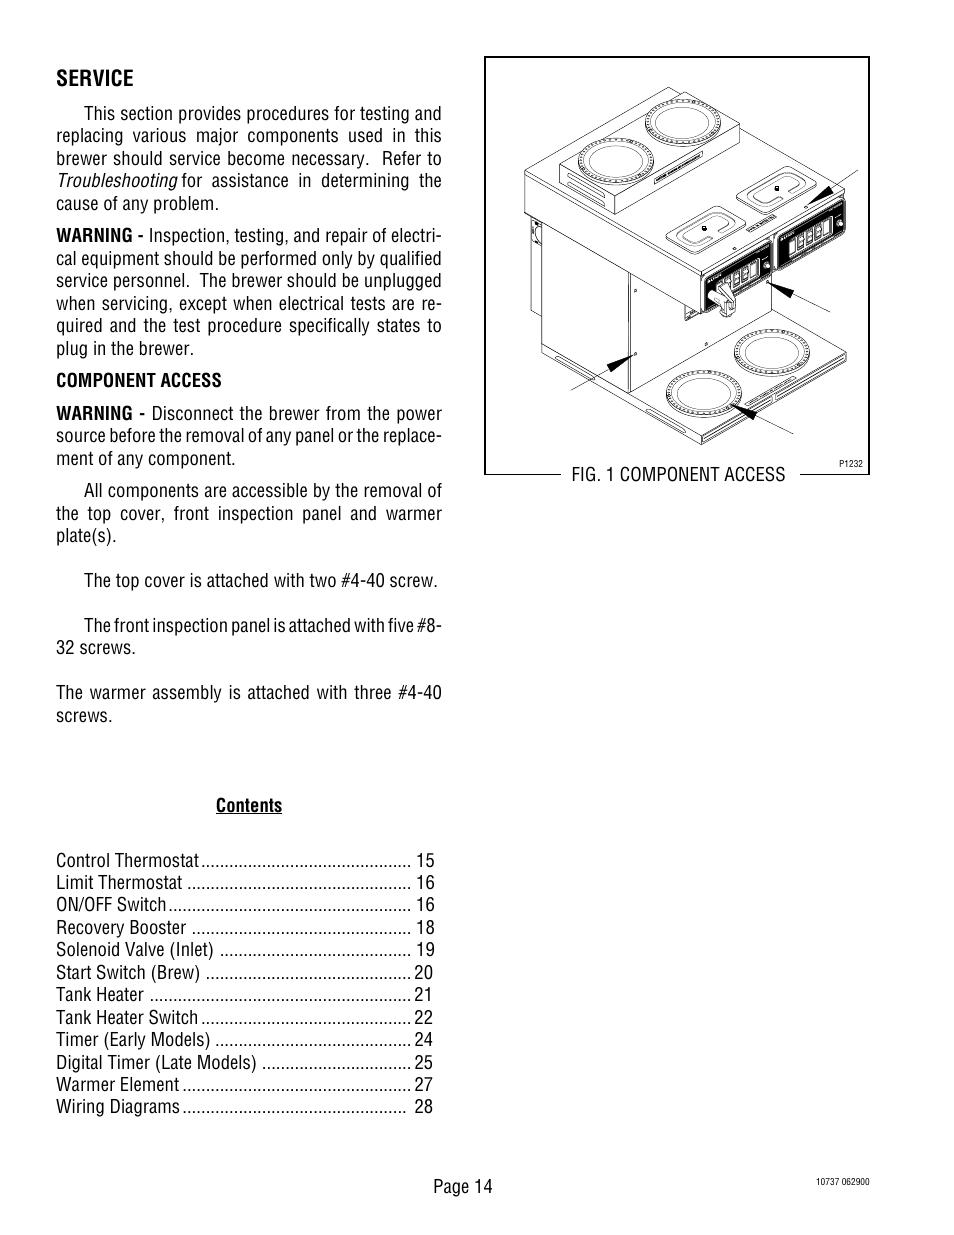 Service | Bunn C TWIN-APS User Manual | Page 14 / 34 on switch wiring diagram, motor wiring diagram, contactor wiring diagram, tachometer wiring diagram, i/o module wiring diagram, remote control wiring diagram, ac drive wiring diagram, software wiring diagram, controller wiring diagram, refrigerator wiring diagram, hour meter wiring diagram, power wiring diagram, thermocouple wiring diagram, battery charger wiring diagram, plc wiring diagram, sensor wiring diagram, heater wiring diagram, toaster oven wiring diagram, control panel wiring diagram, heating element wiring diagram,